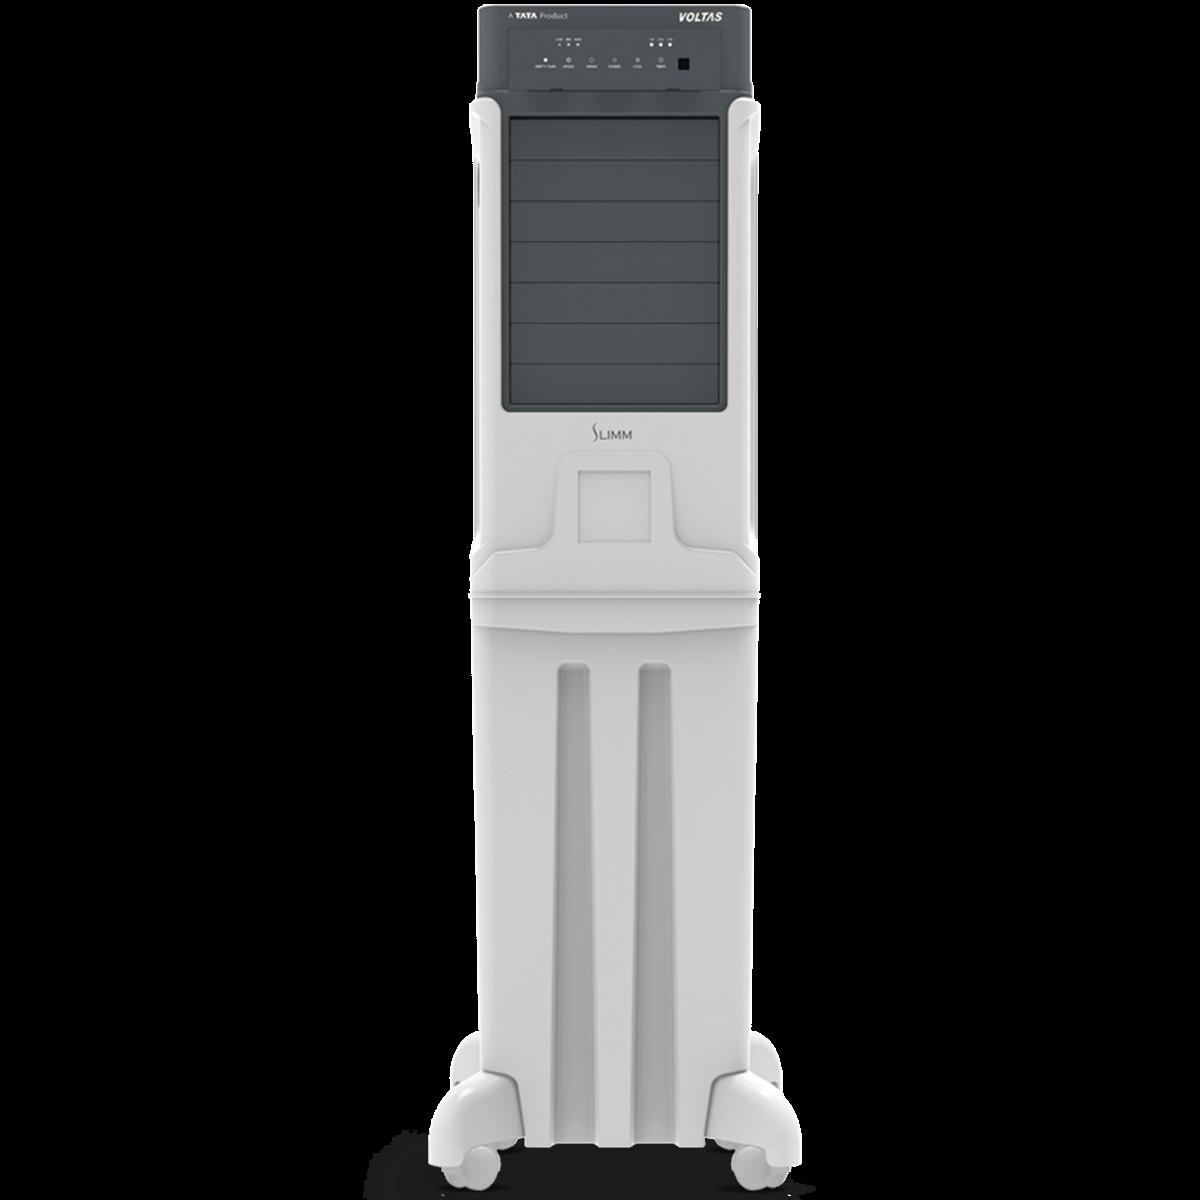 VOLTAS  | Fresh Air Cooler SLIMM 35LT